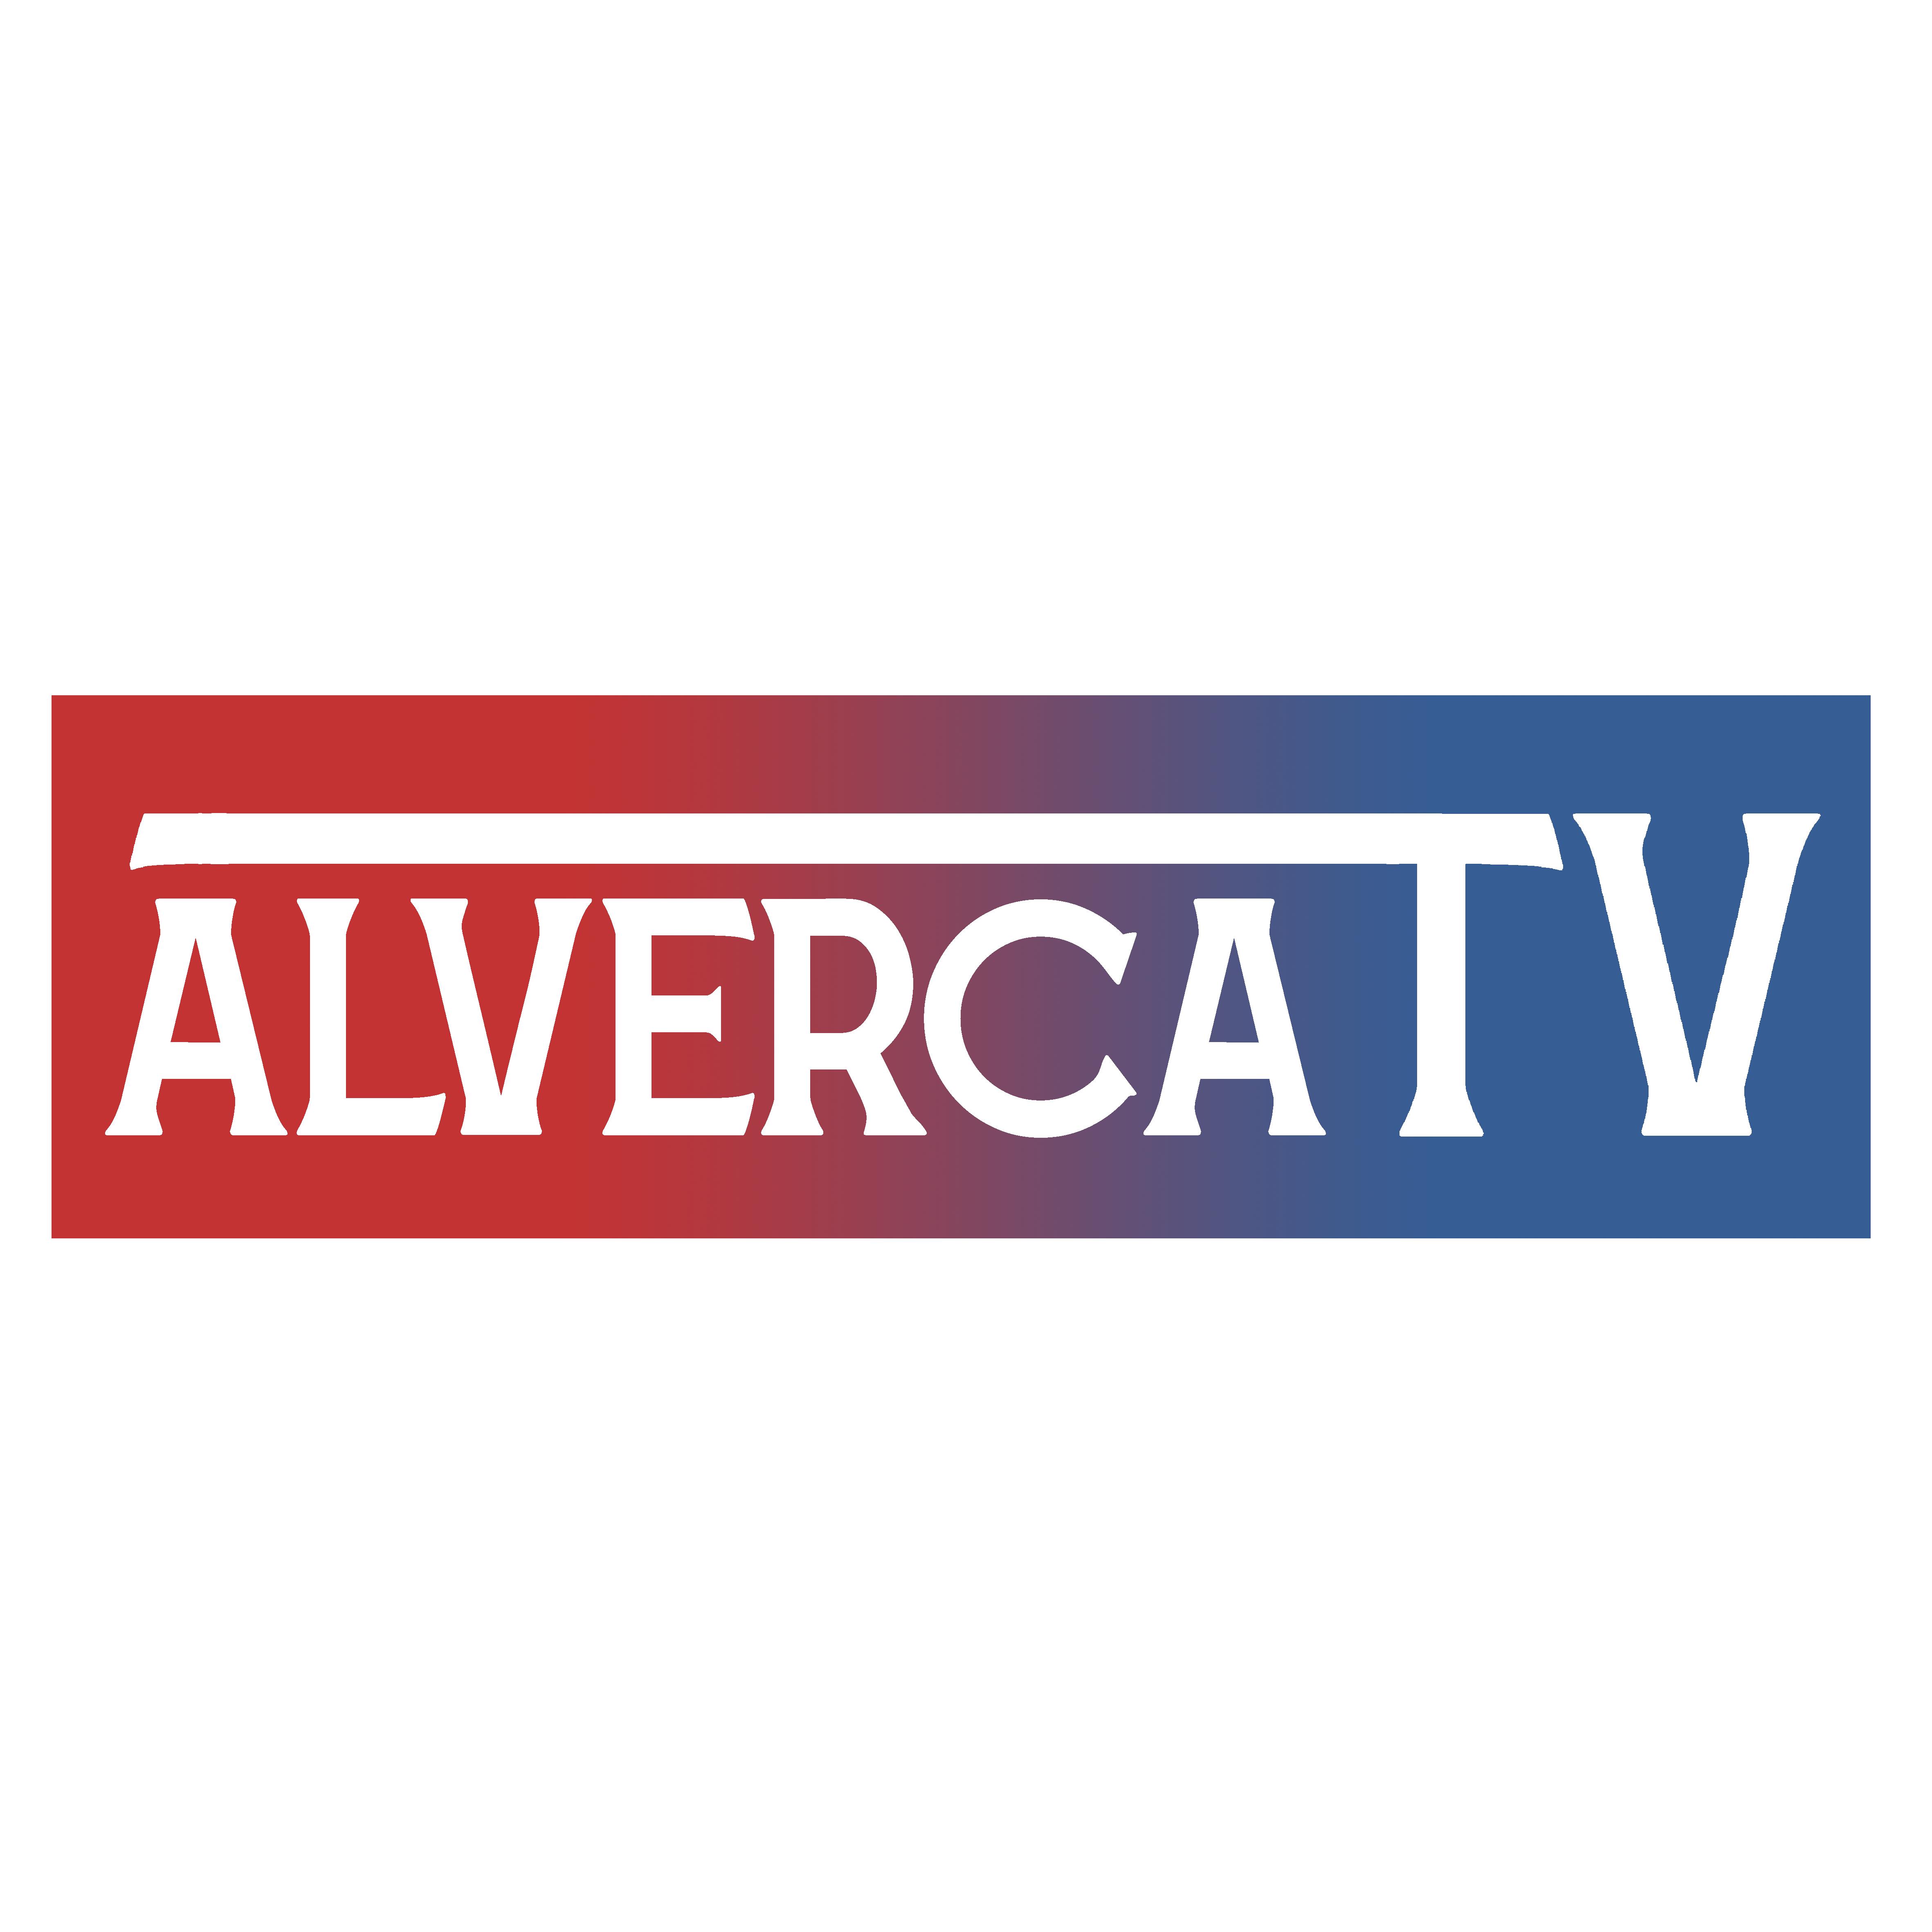 AlvercaTV